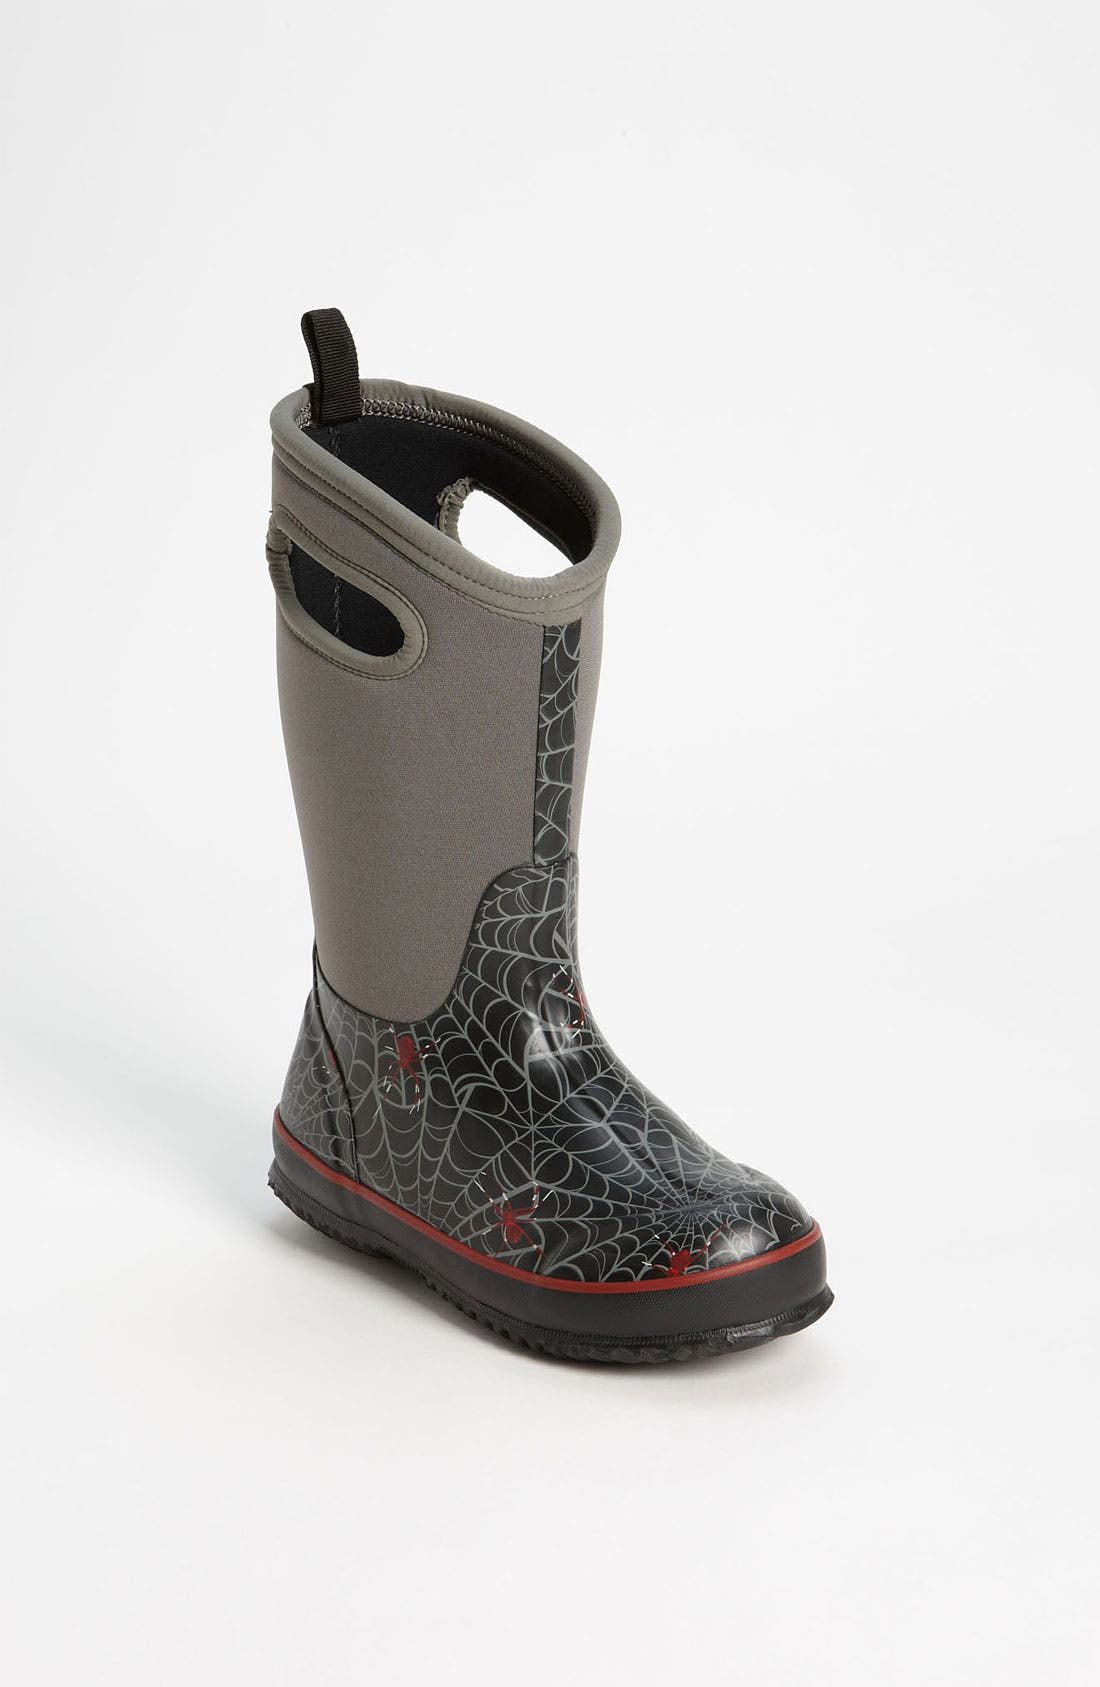 Alternate Image 1 Selected - Bogs 'Classic High - Spiders' Waterproof Boot (Toddler, Little Kid, & Big Kid)